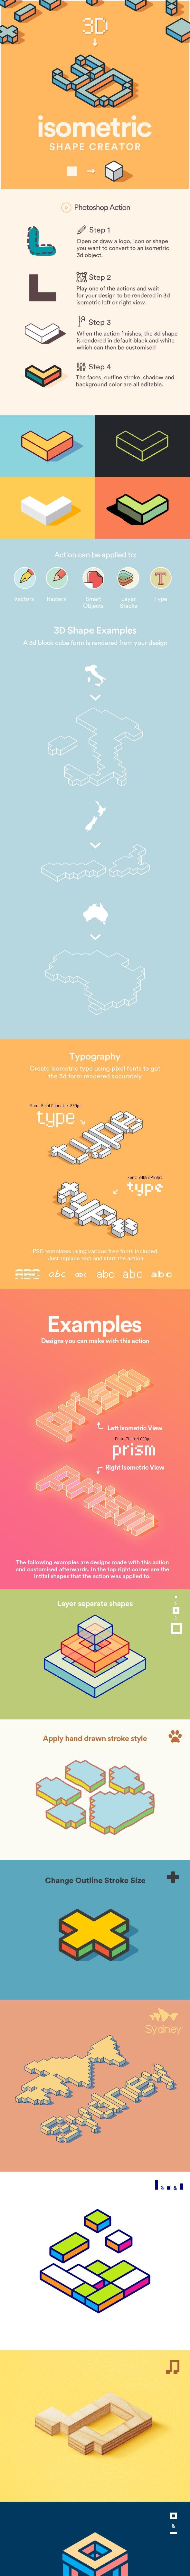 3D Isometric Shape Creator - Actions Photoshop